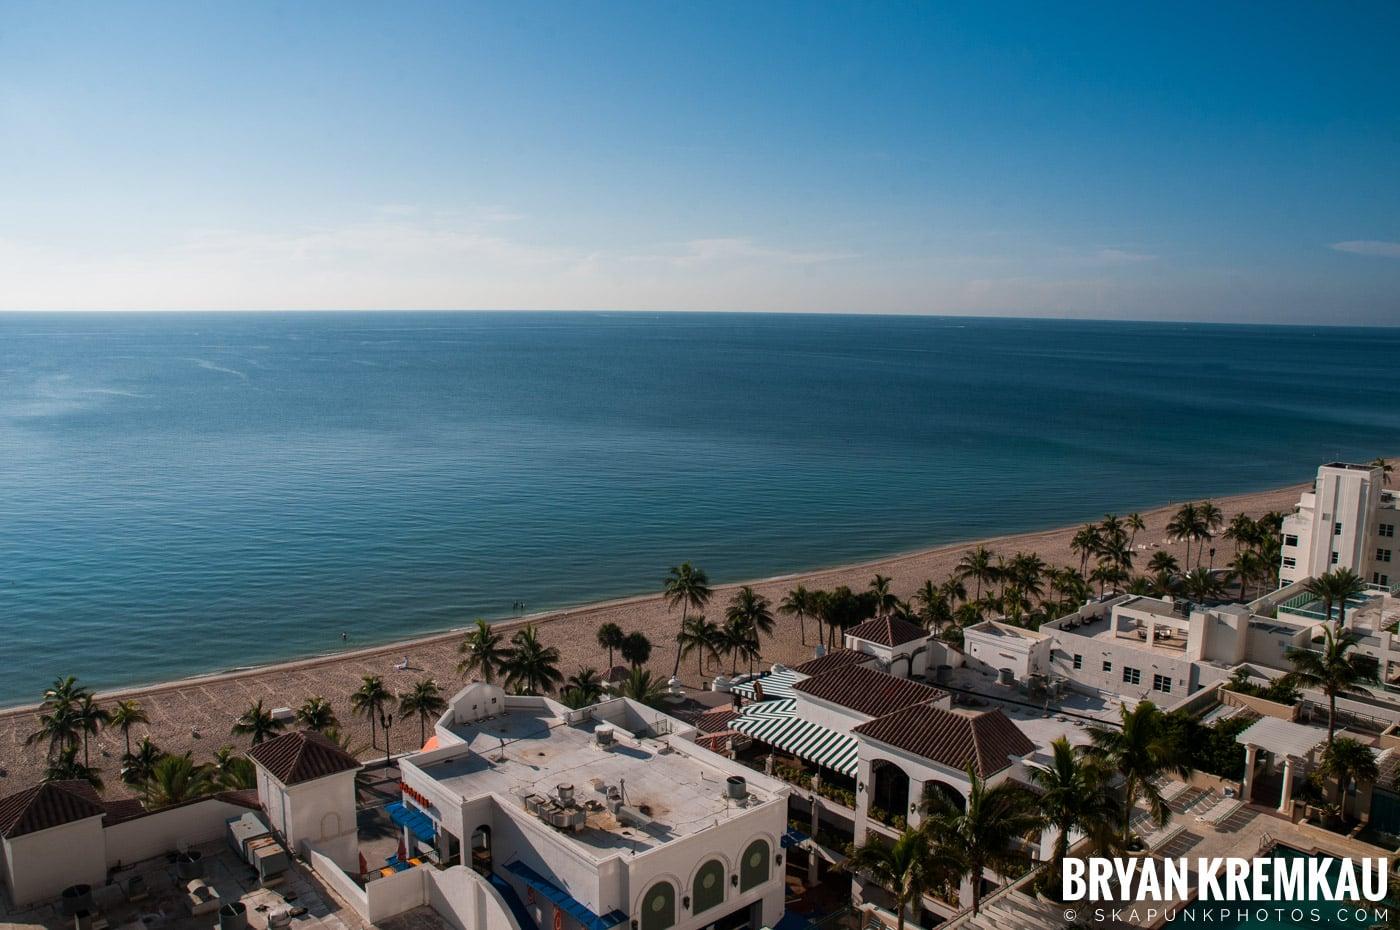 Florida Keys Vacation - 7.09.10 - 7.15.10 (90)